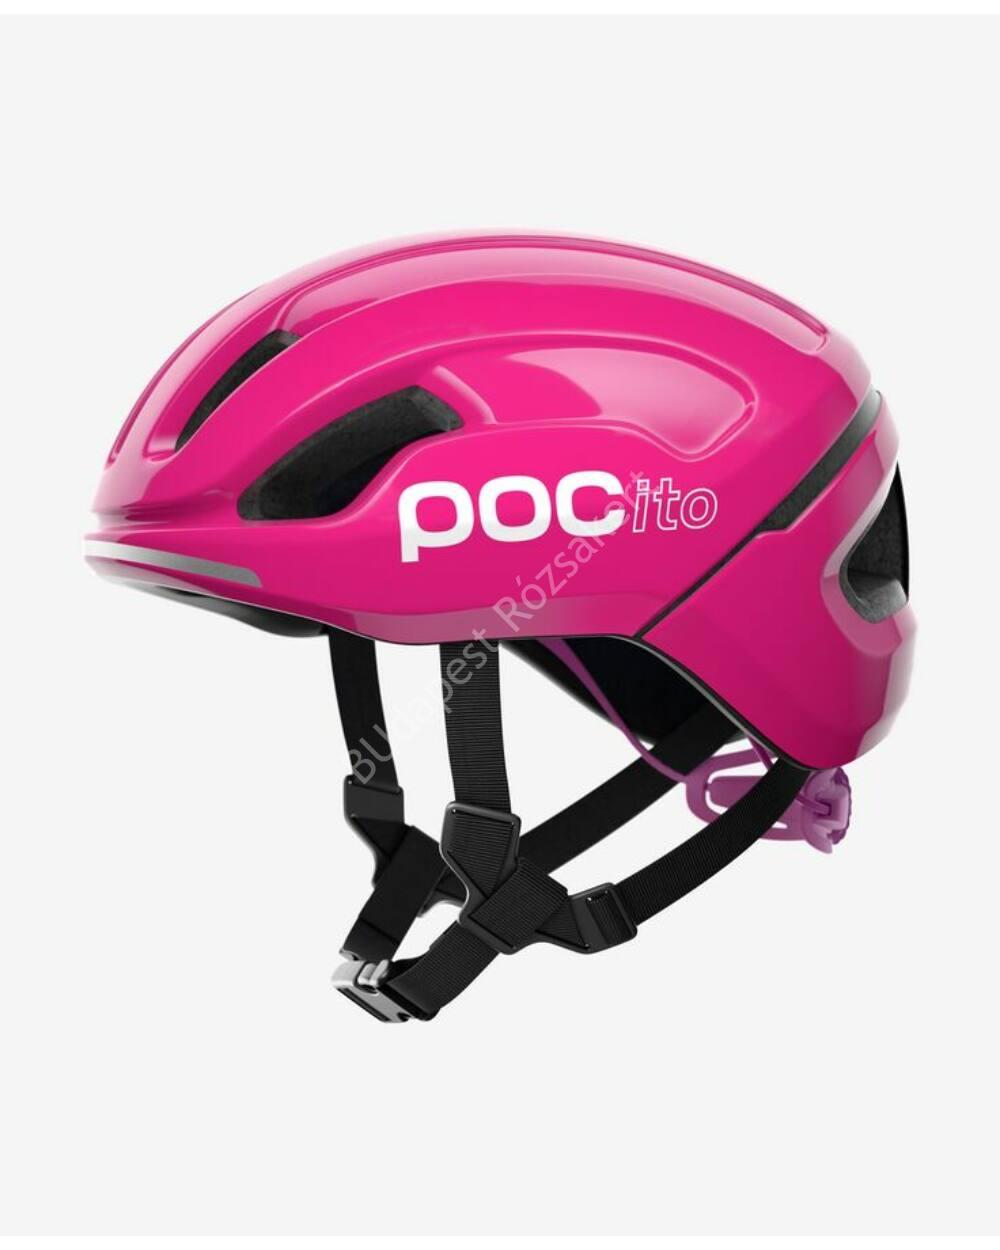 POC Pocito Omne Spin fluorescent pink bukósisak, 48-52 cm